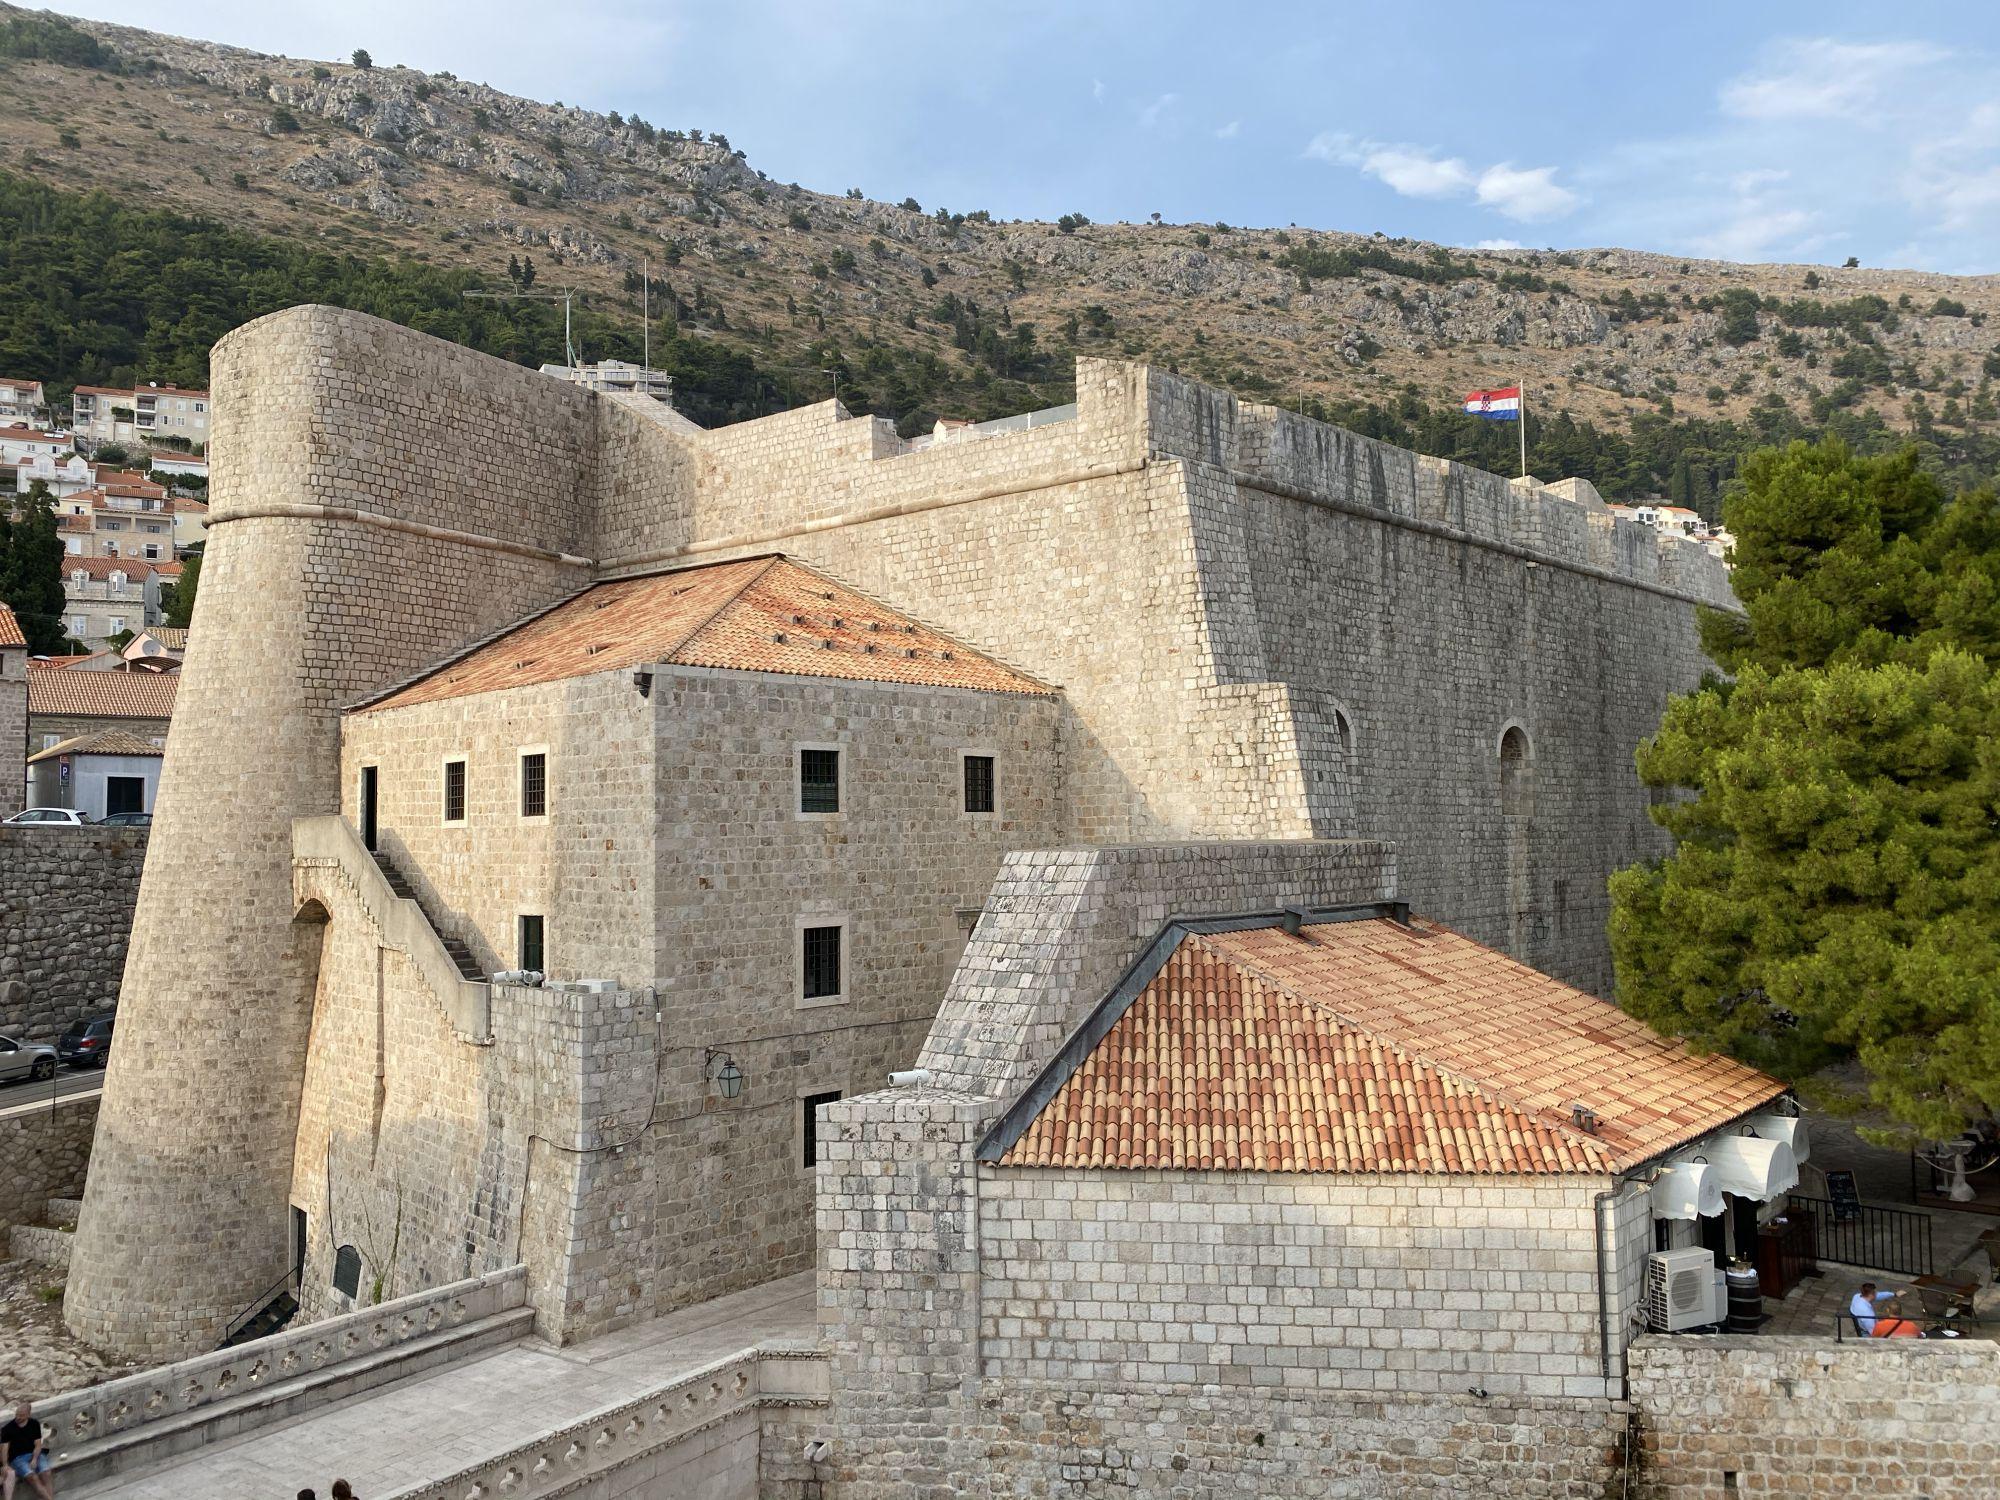 Minčeta fortress, Dubrovnik, Croatia, photo by K2 & Croatian Attractions